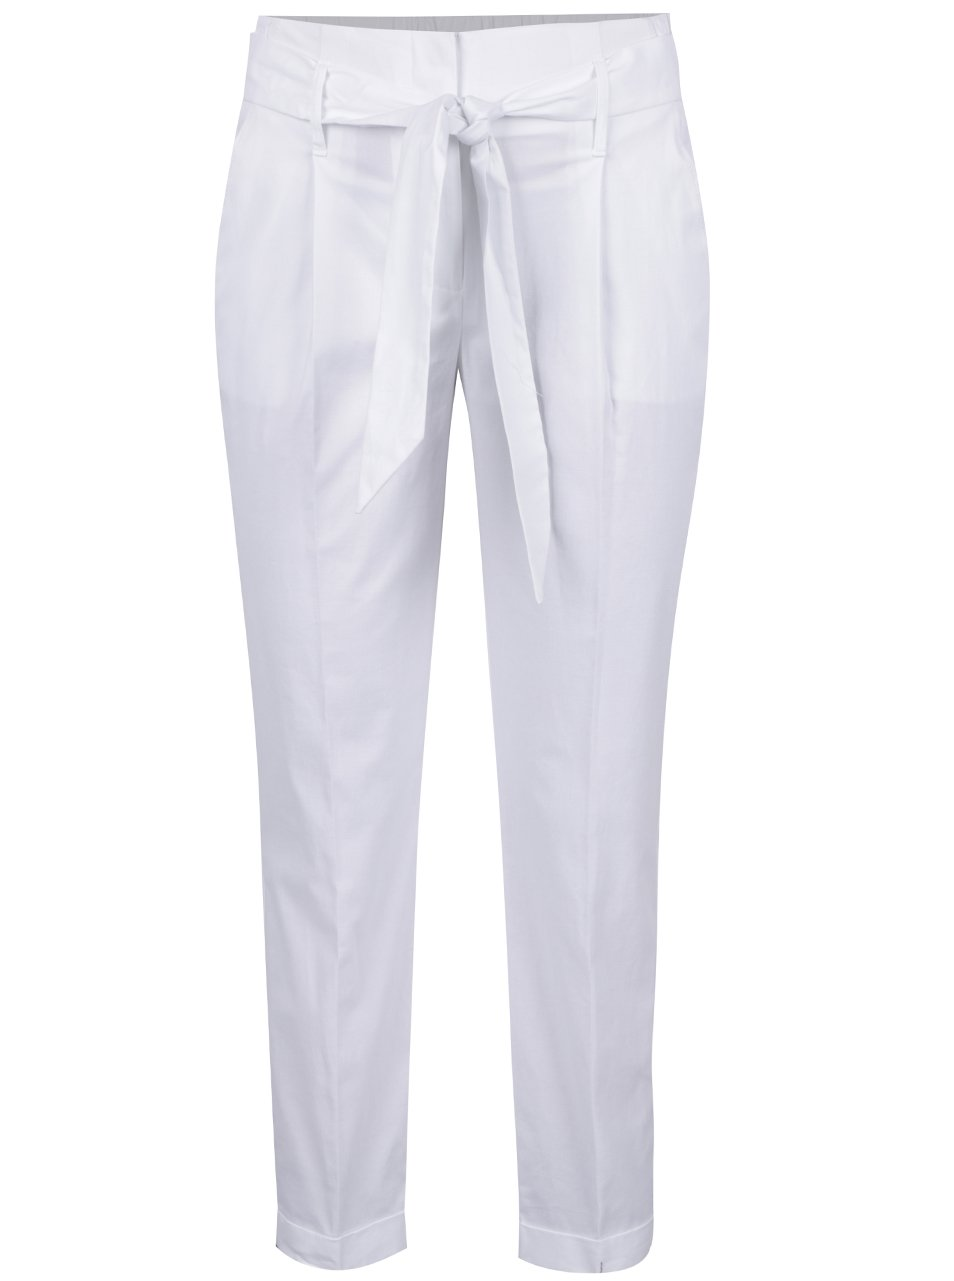 Bílé dámské kalhoty Dorothy Perkins